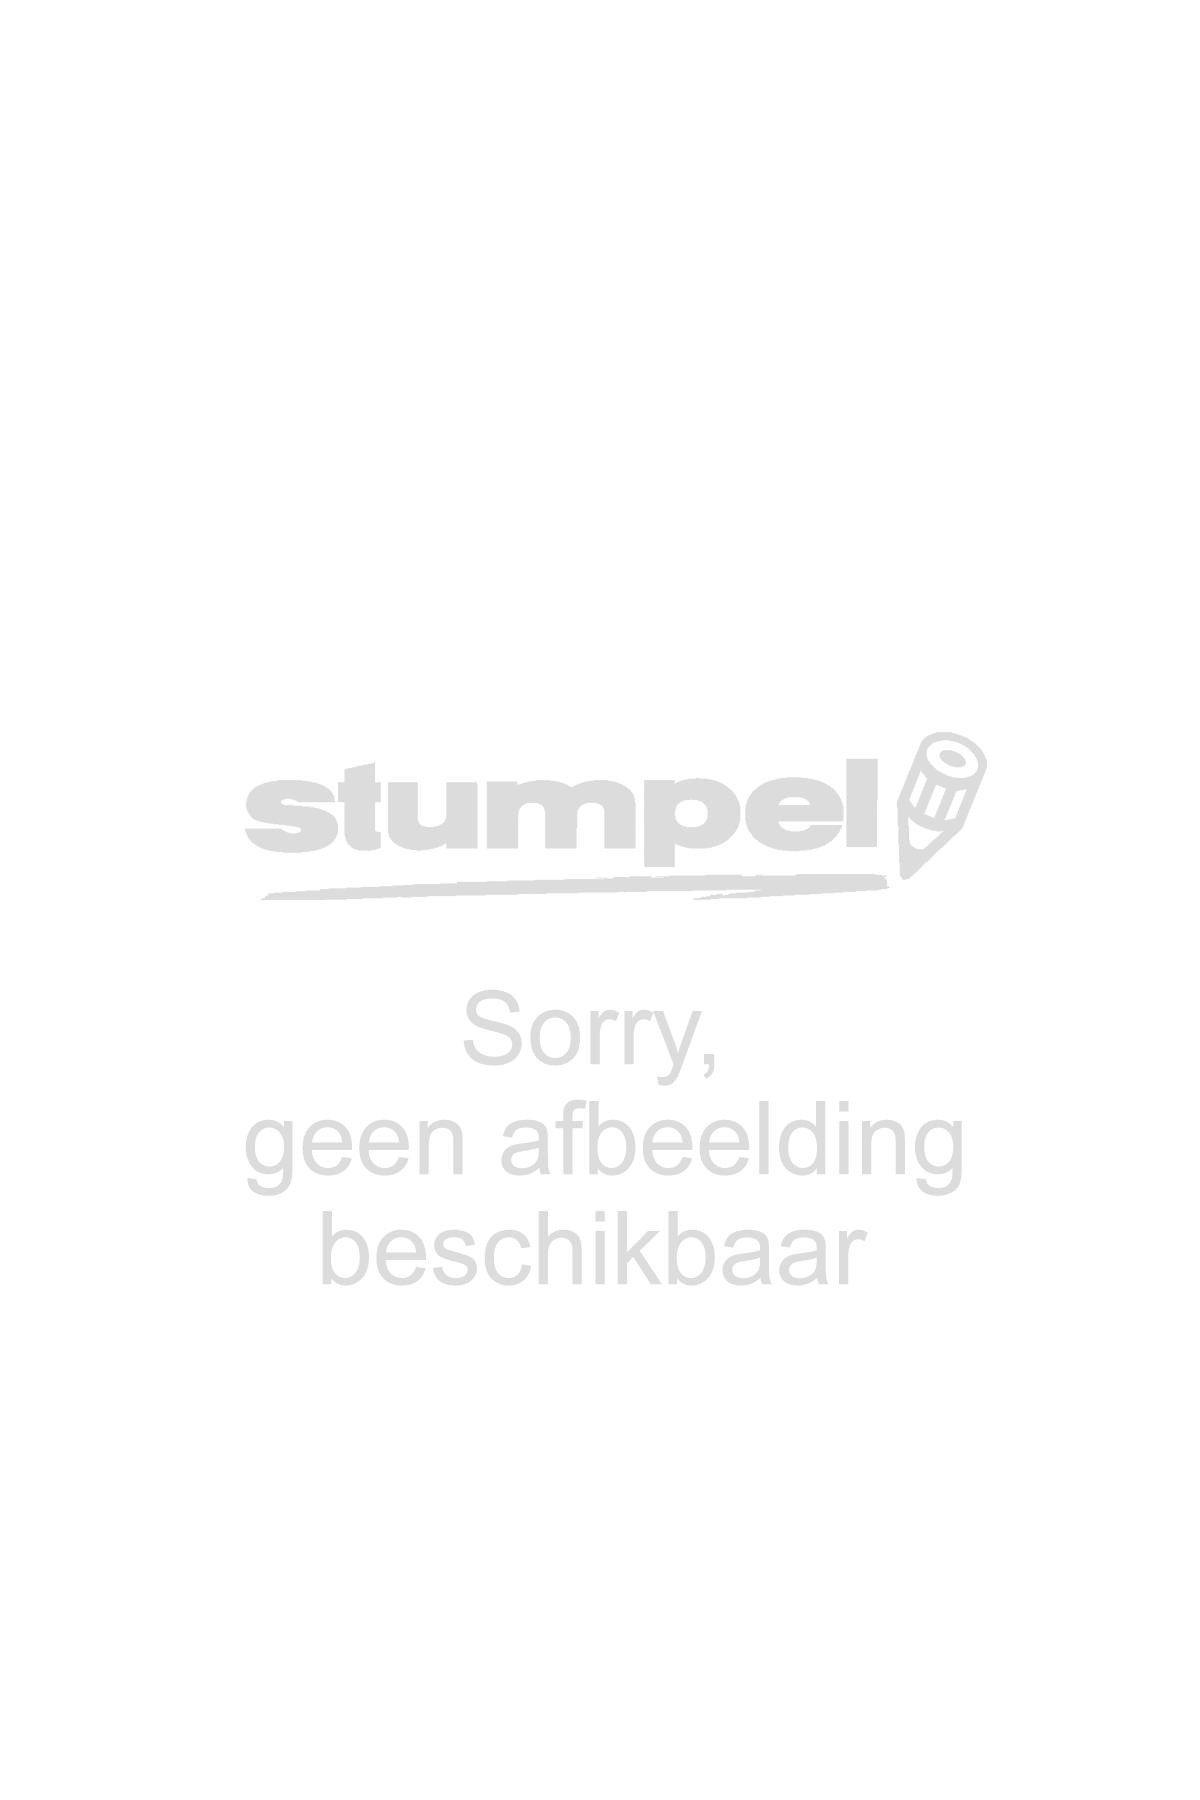 magneetkaart-gezicht-op-amsterdam-10693909